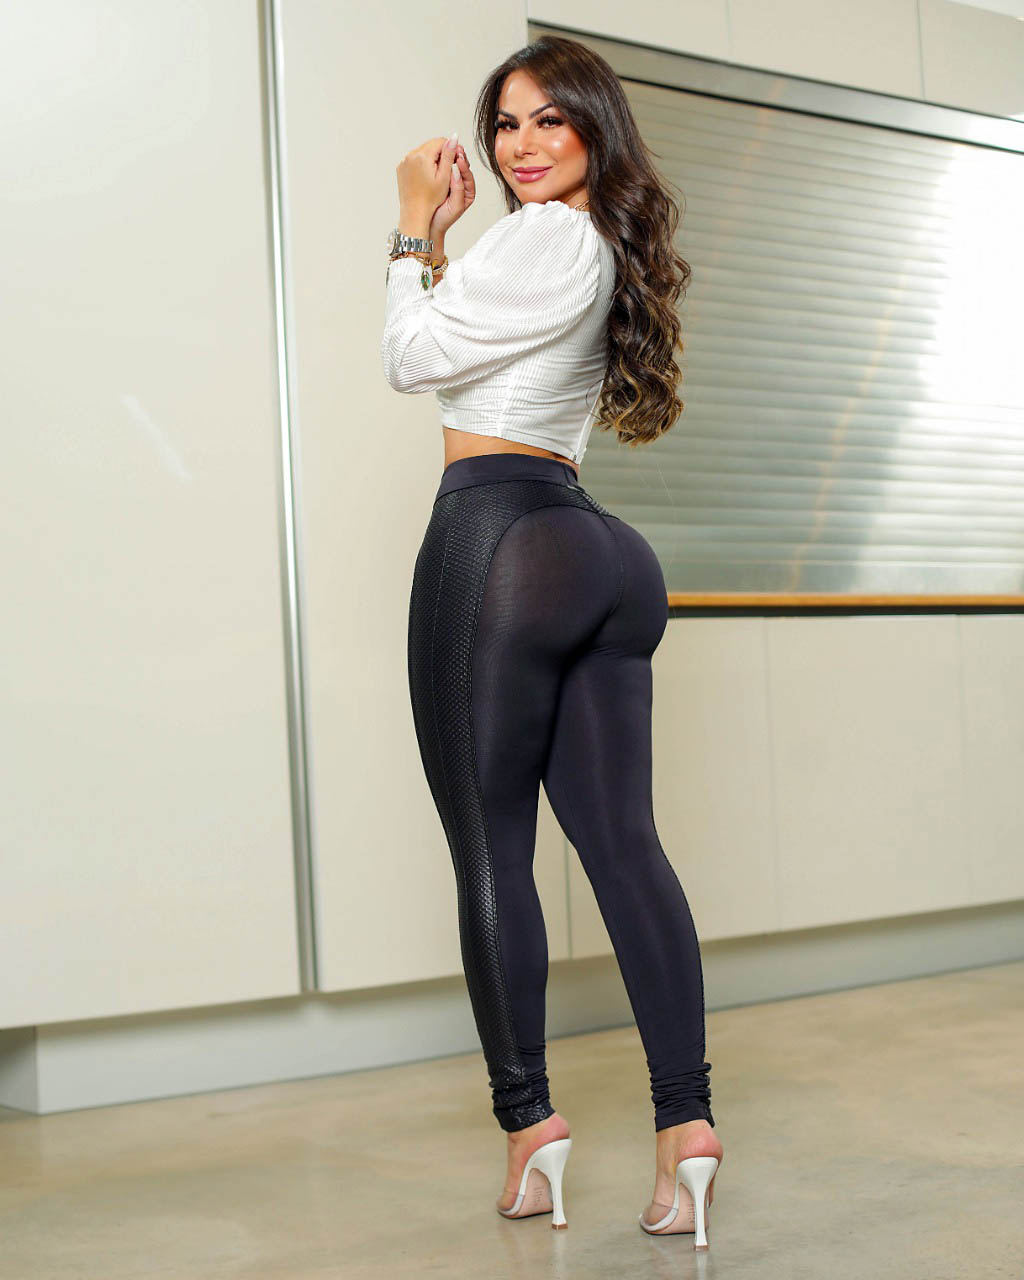 Calça Legging Modeladora com Faixa Preta - Empina Bumbum e Comprime a Barriga